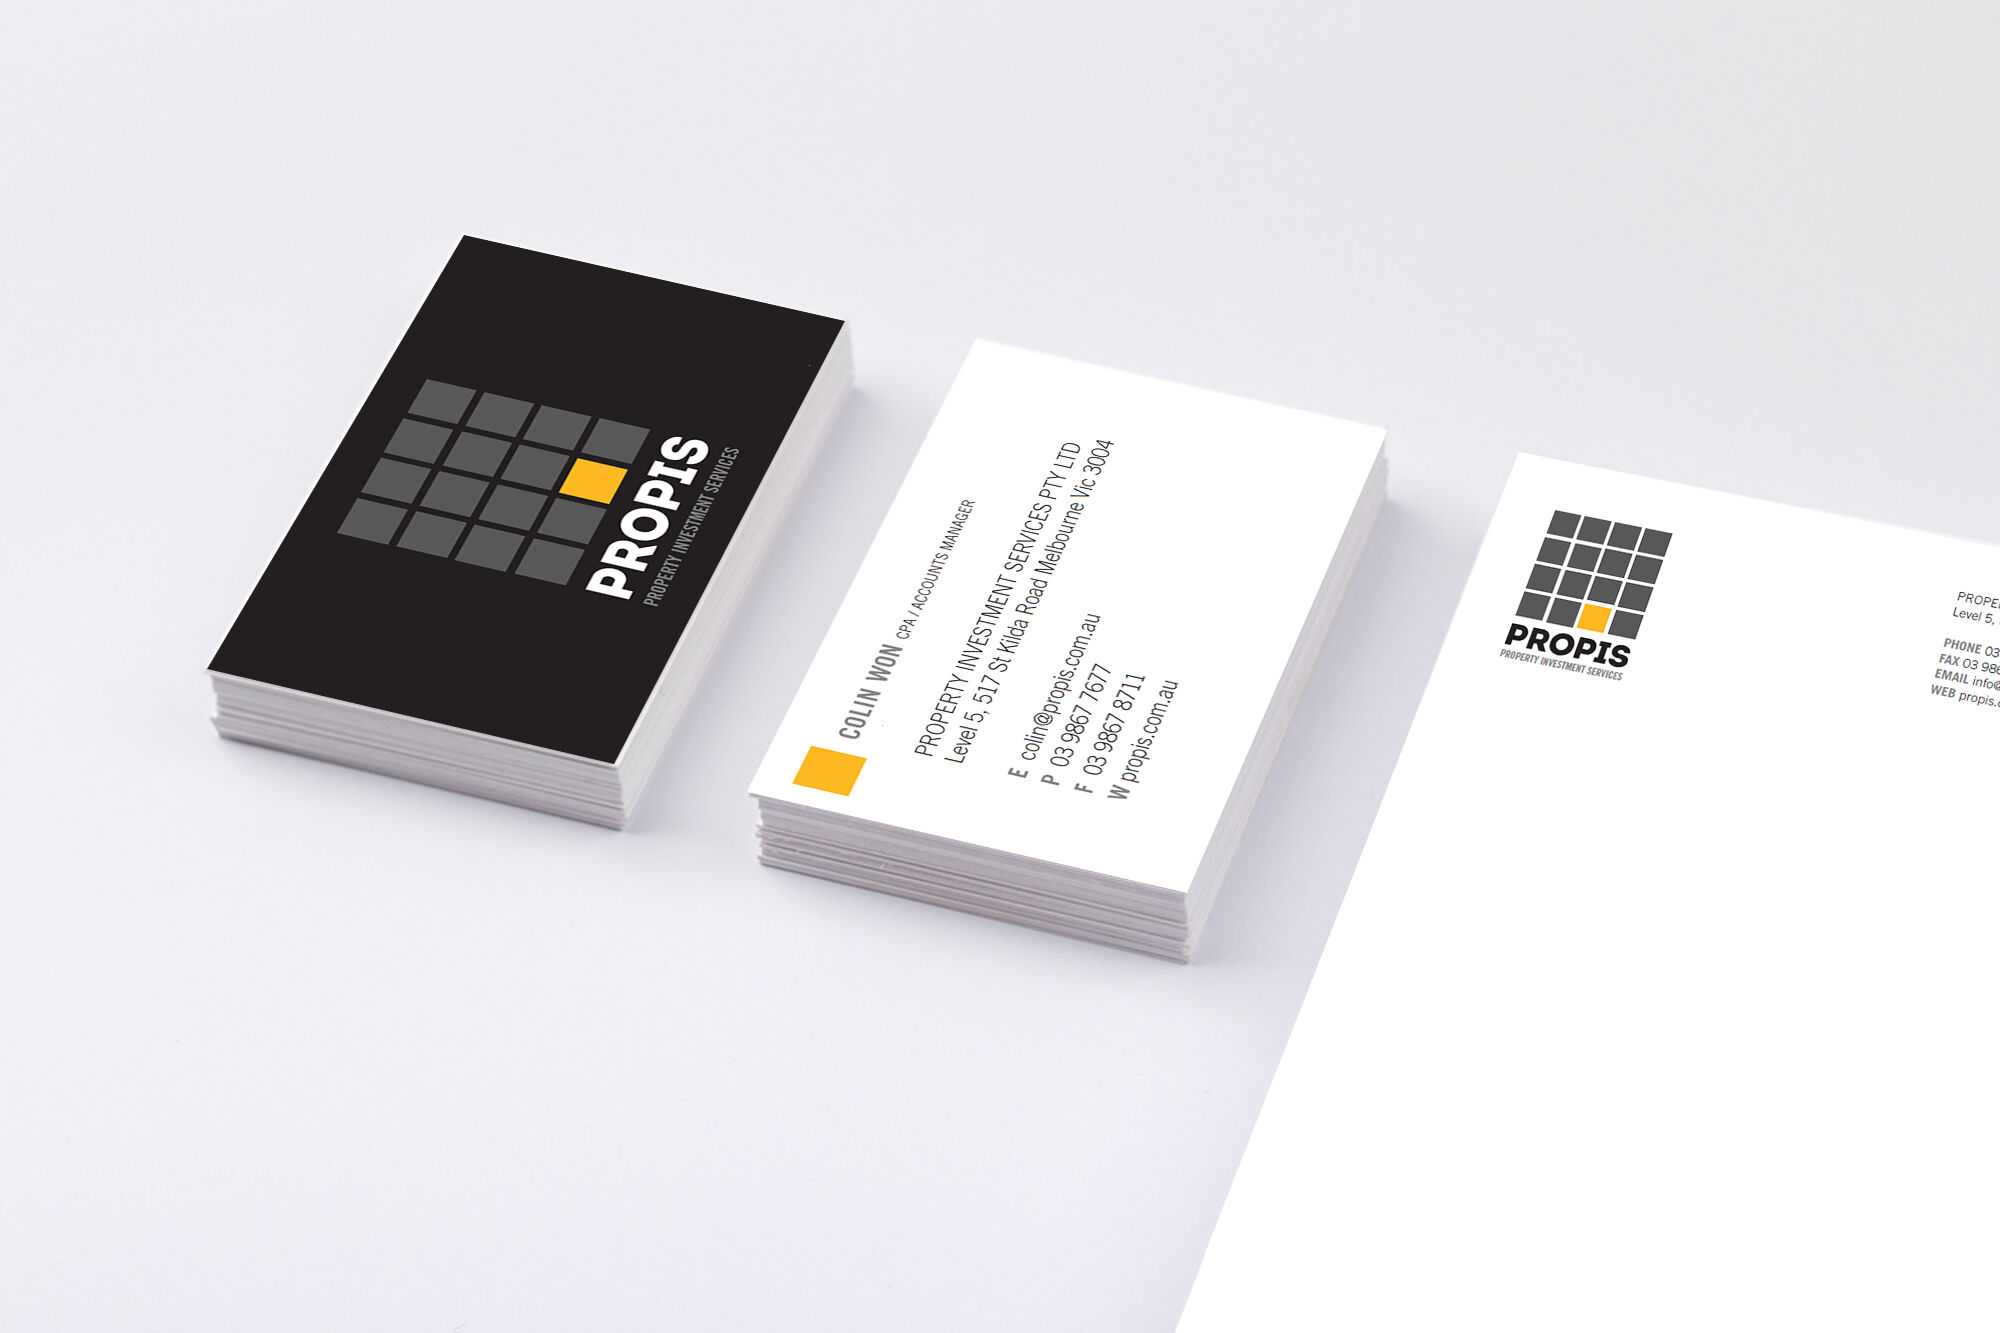 PROPIS Brand Design & Development